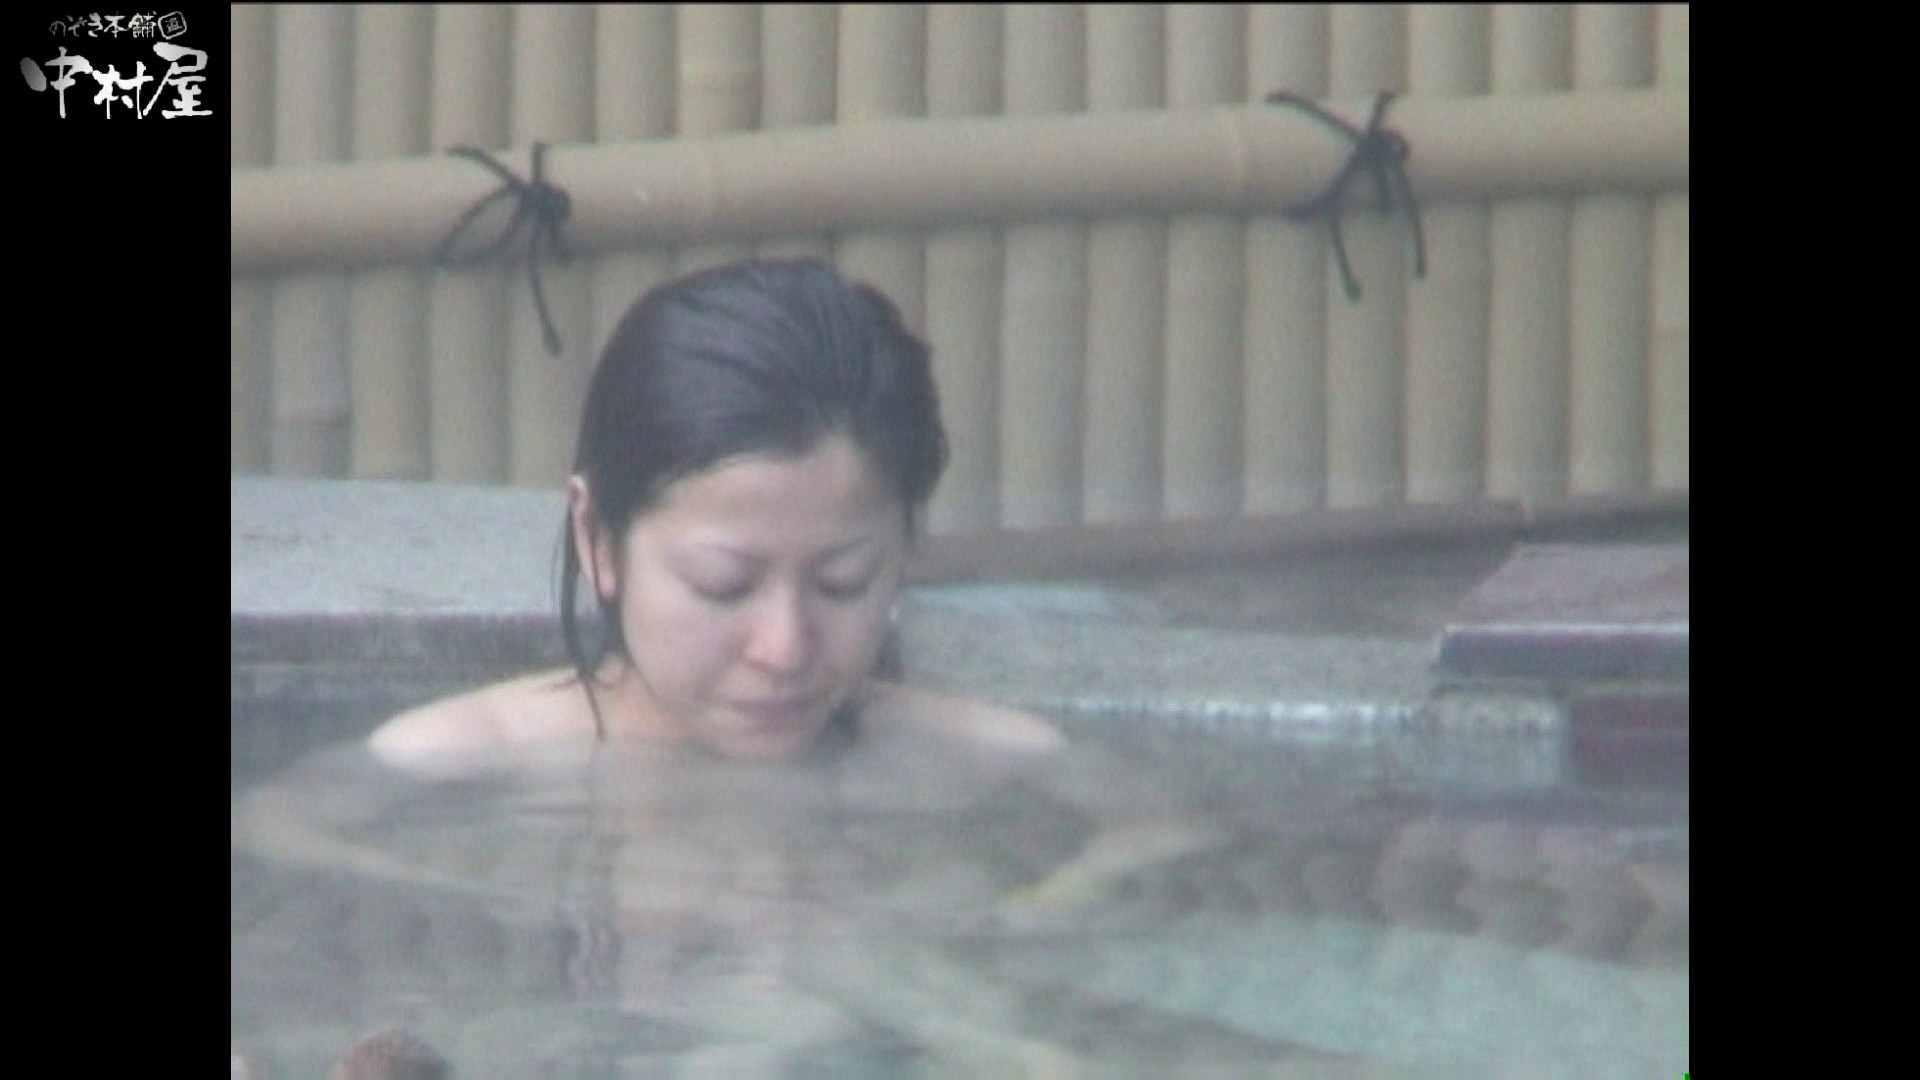 Aquaな露天風呂Vol.986 盗撮  94連発 45